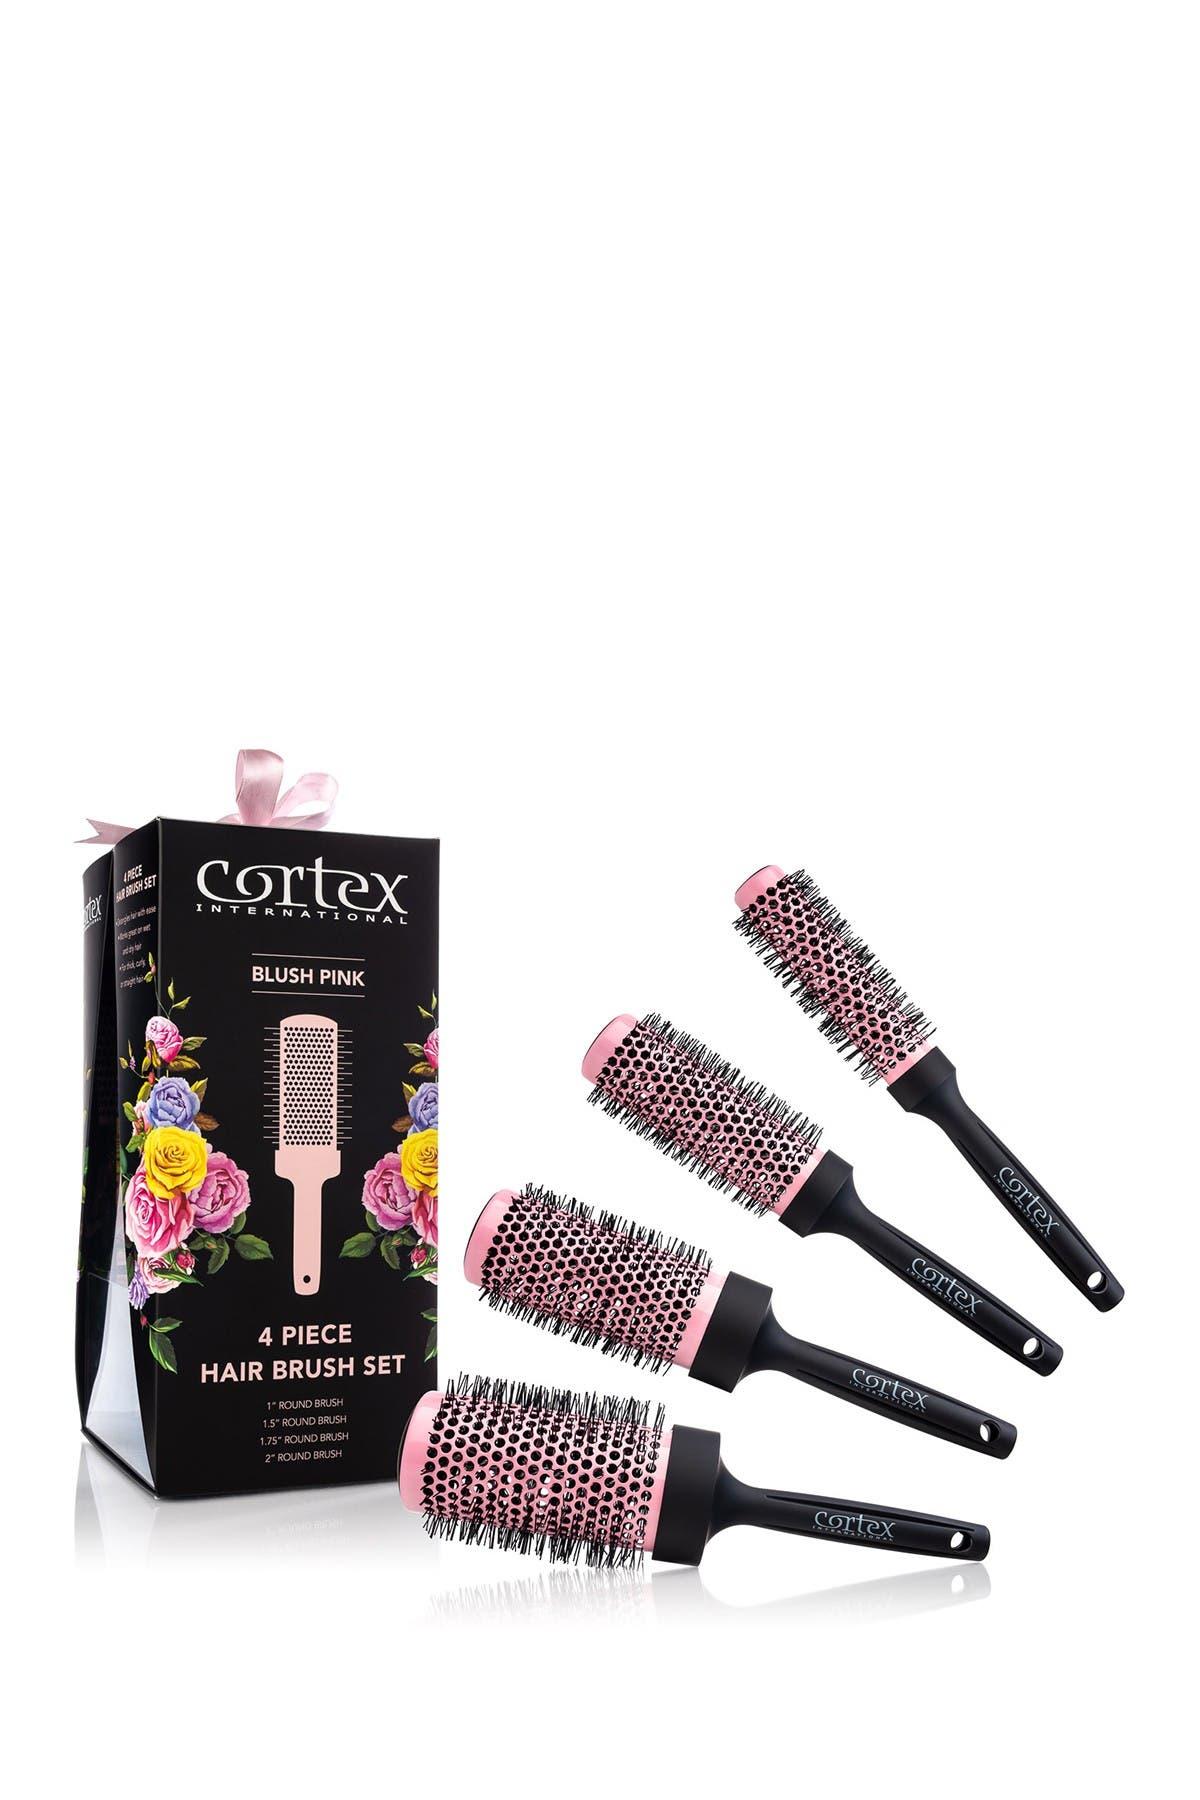 Image of CORTEXT PROFESSIONAL Supermodel Volume 4-Piece Limited Edition Round Brush Set - Blush Pink